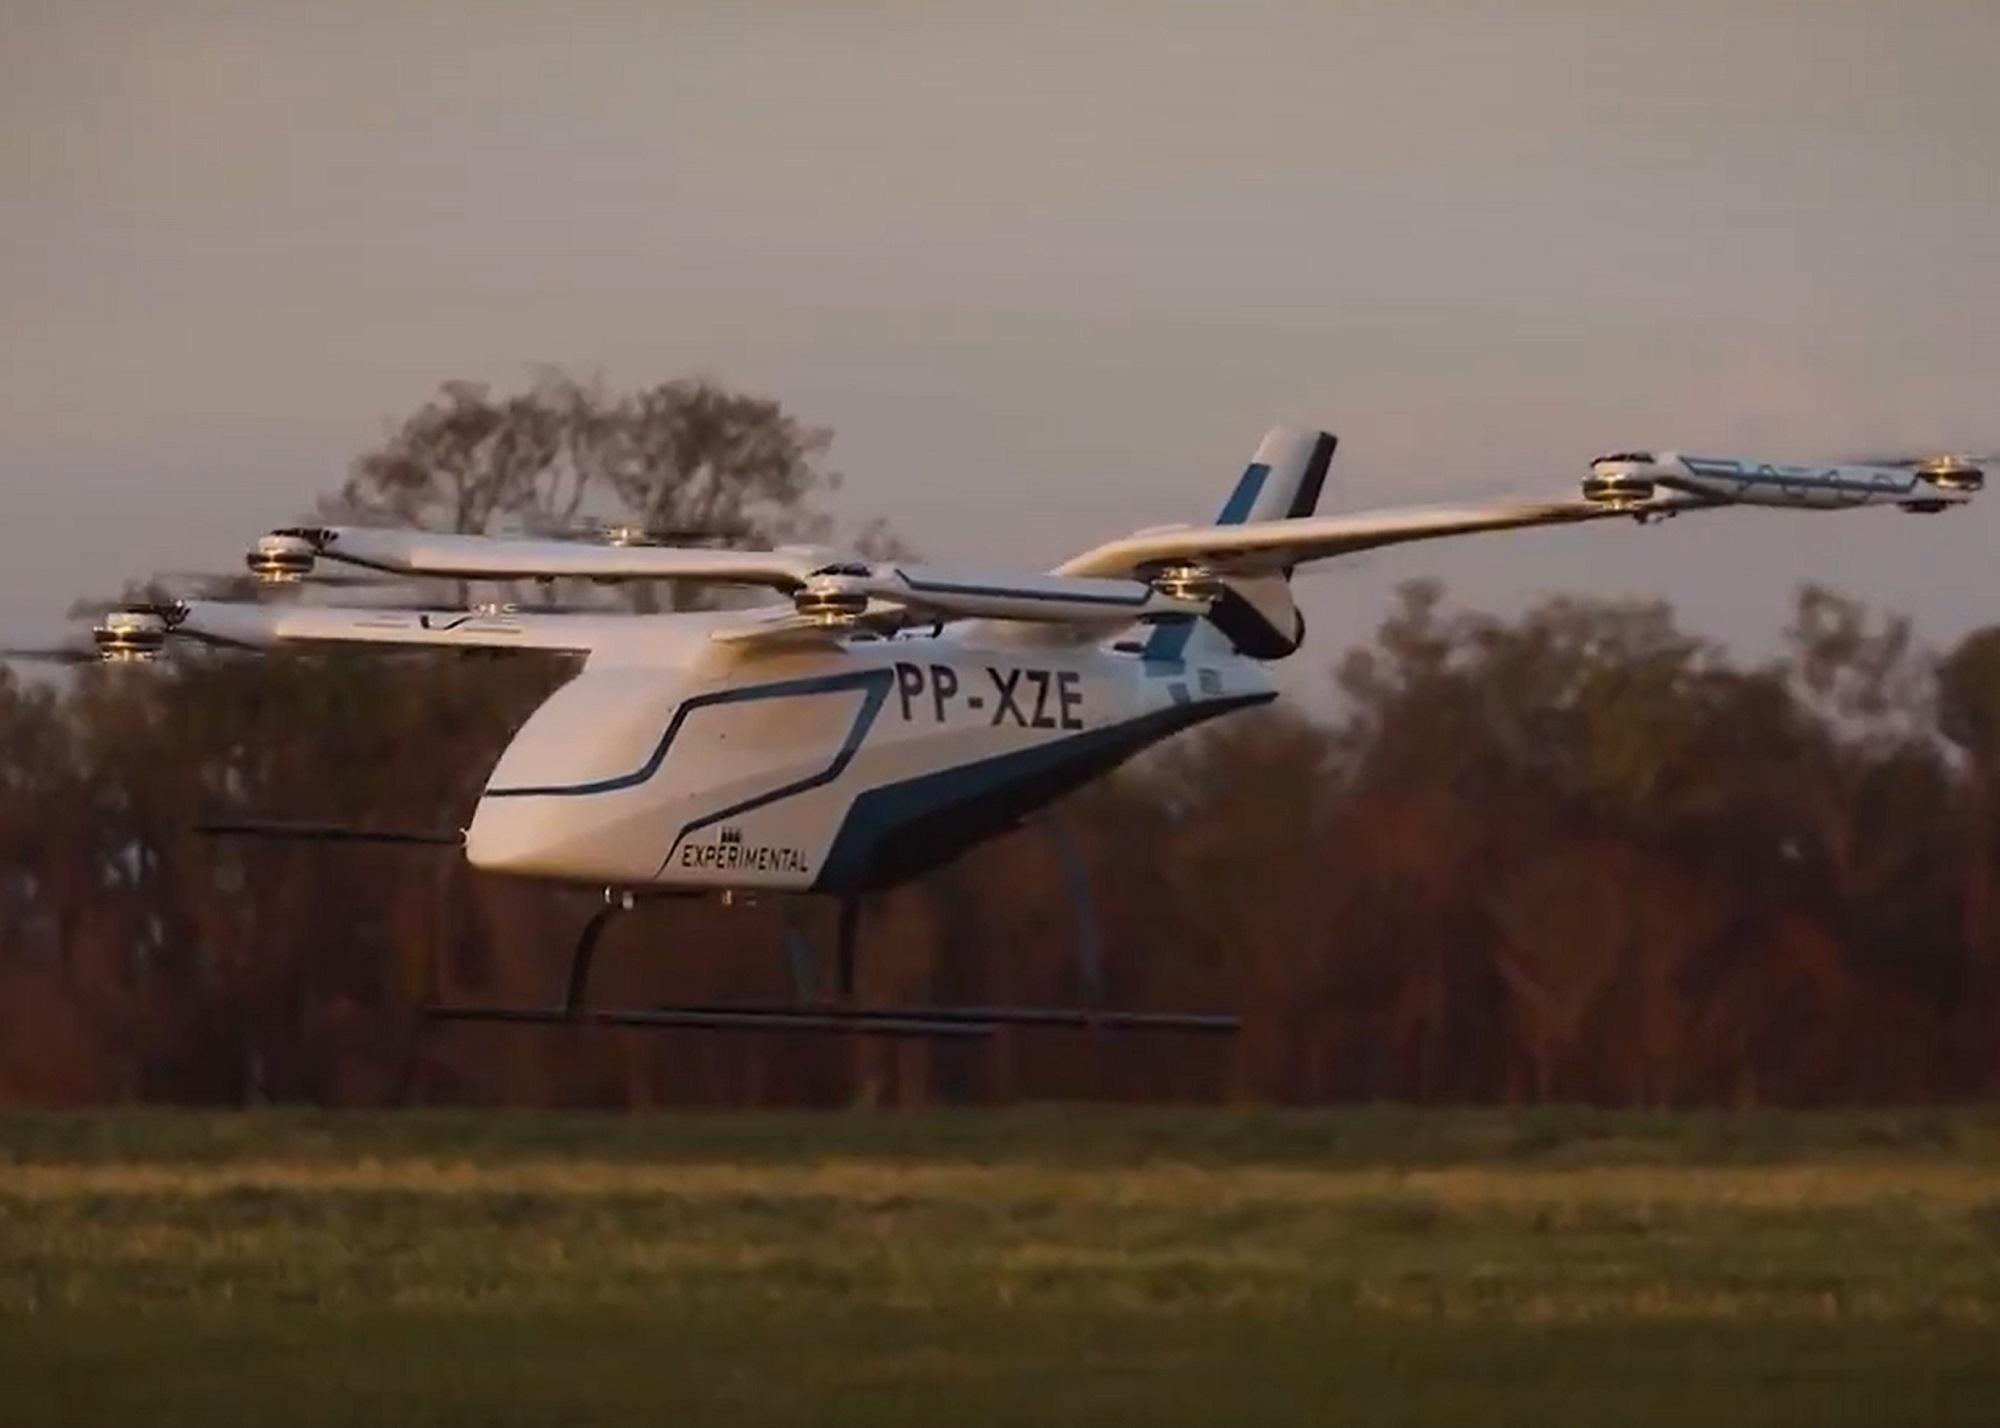 Eve flight demonstrator